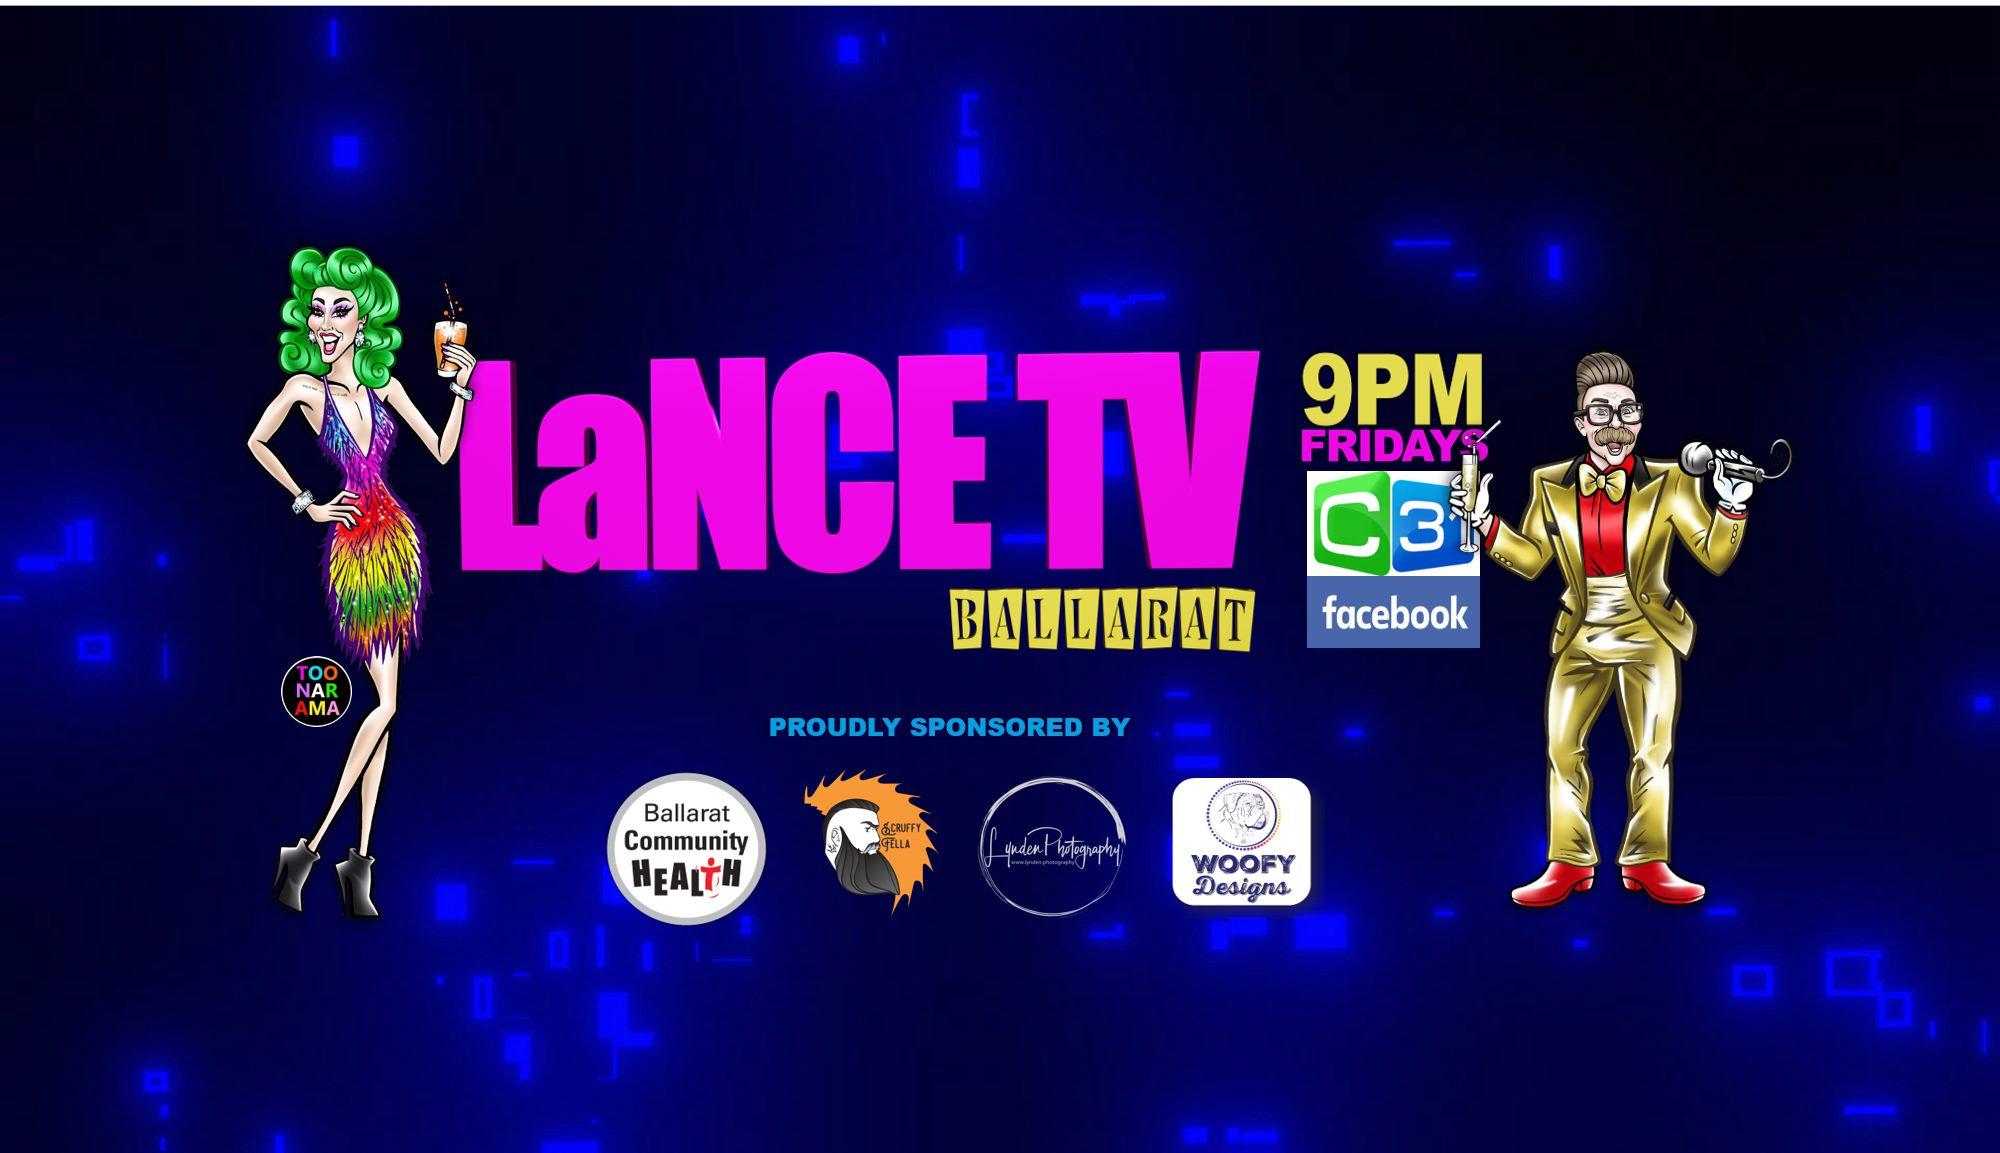 Graphic illustration of Lance De Boyle saying 'Lance TV'